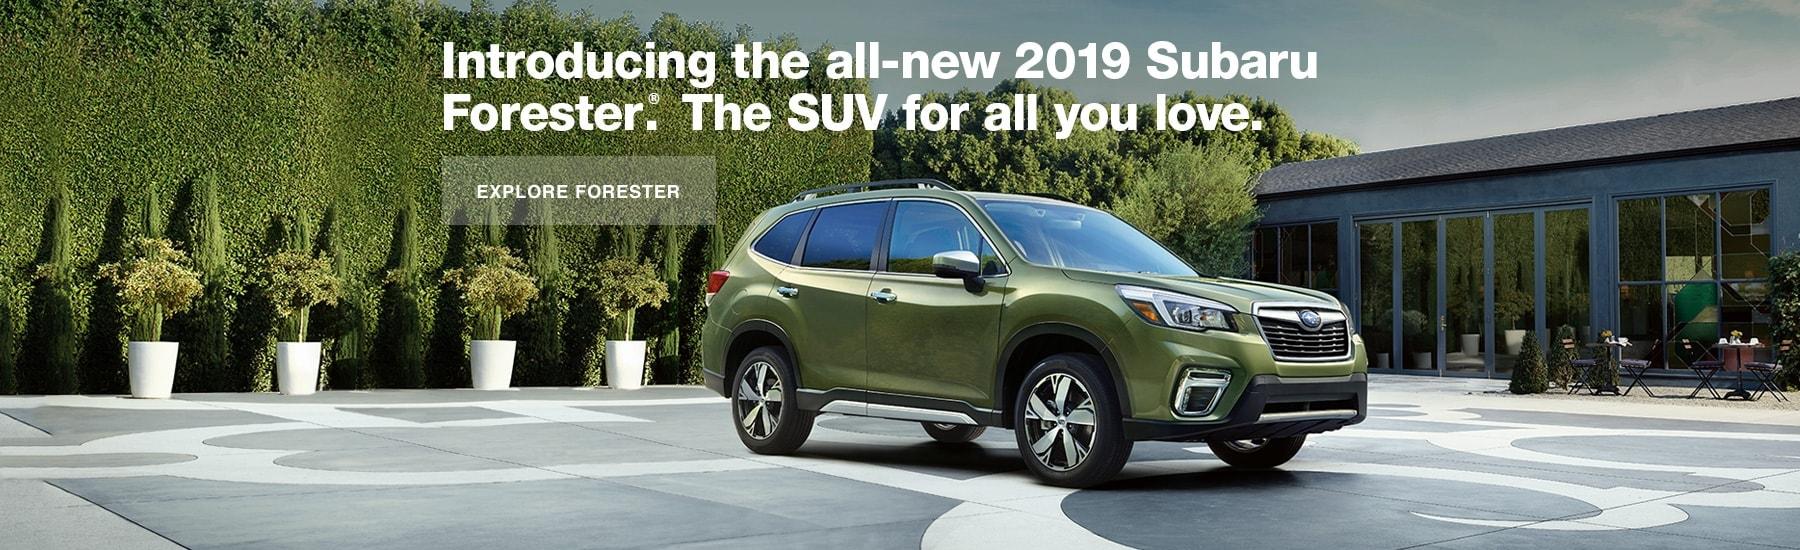 Subaru Dealer Near Me >> New Used Subaru Dealer Near Atlanta Kennesaw Subaru Of Kennesaw